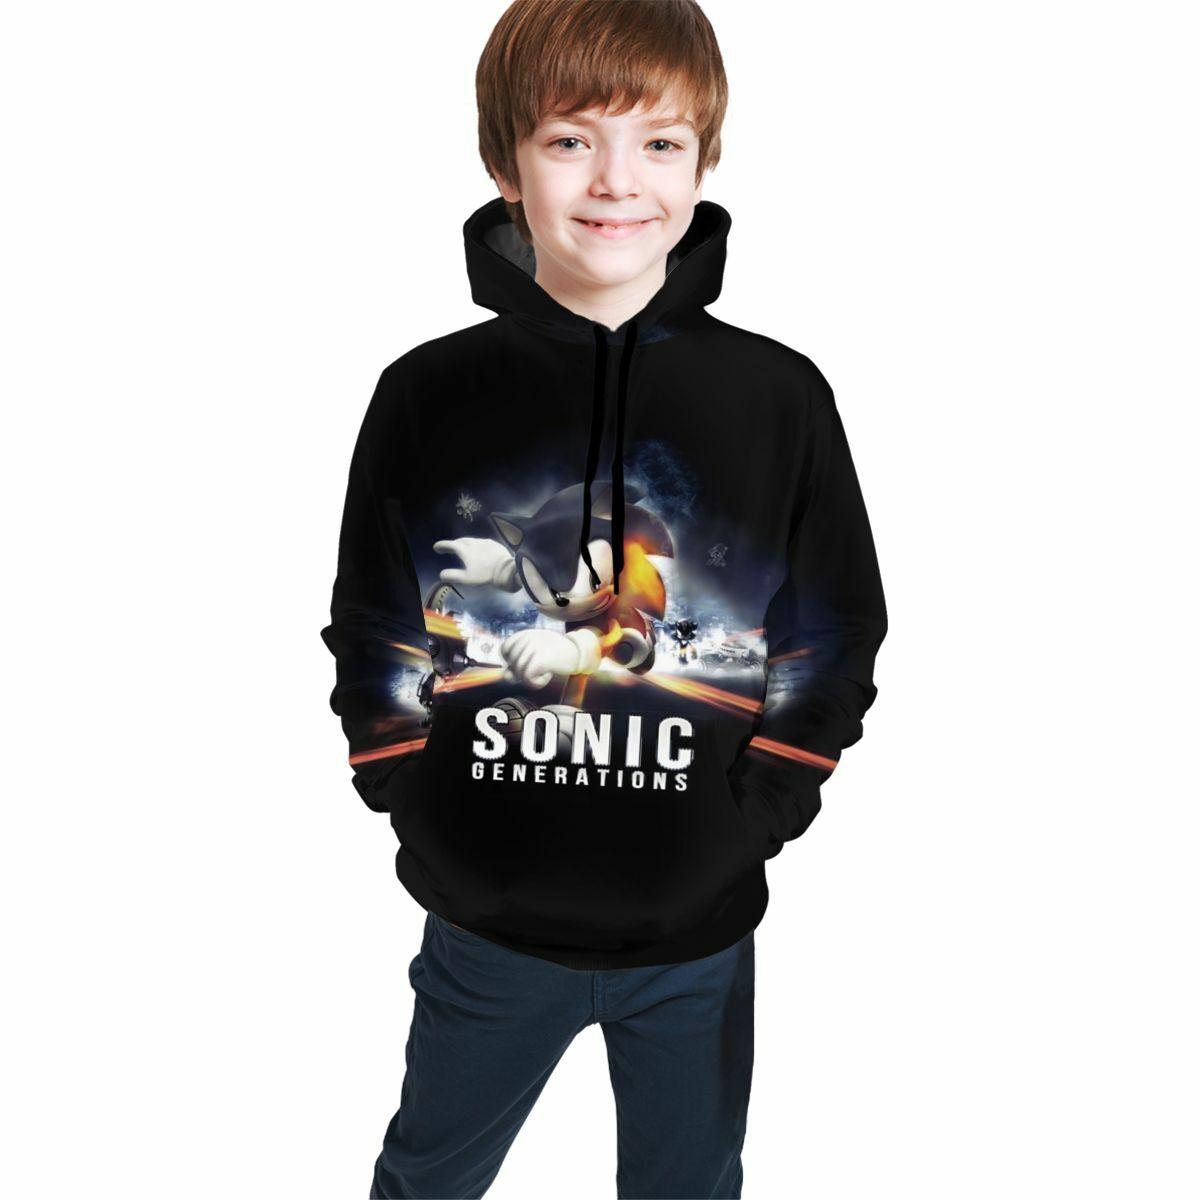 Sonic the Hedgehog Anime Art Print Boys Teens Pullover Hoodies Sweatshirt Gift